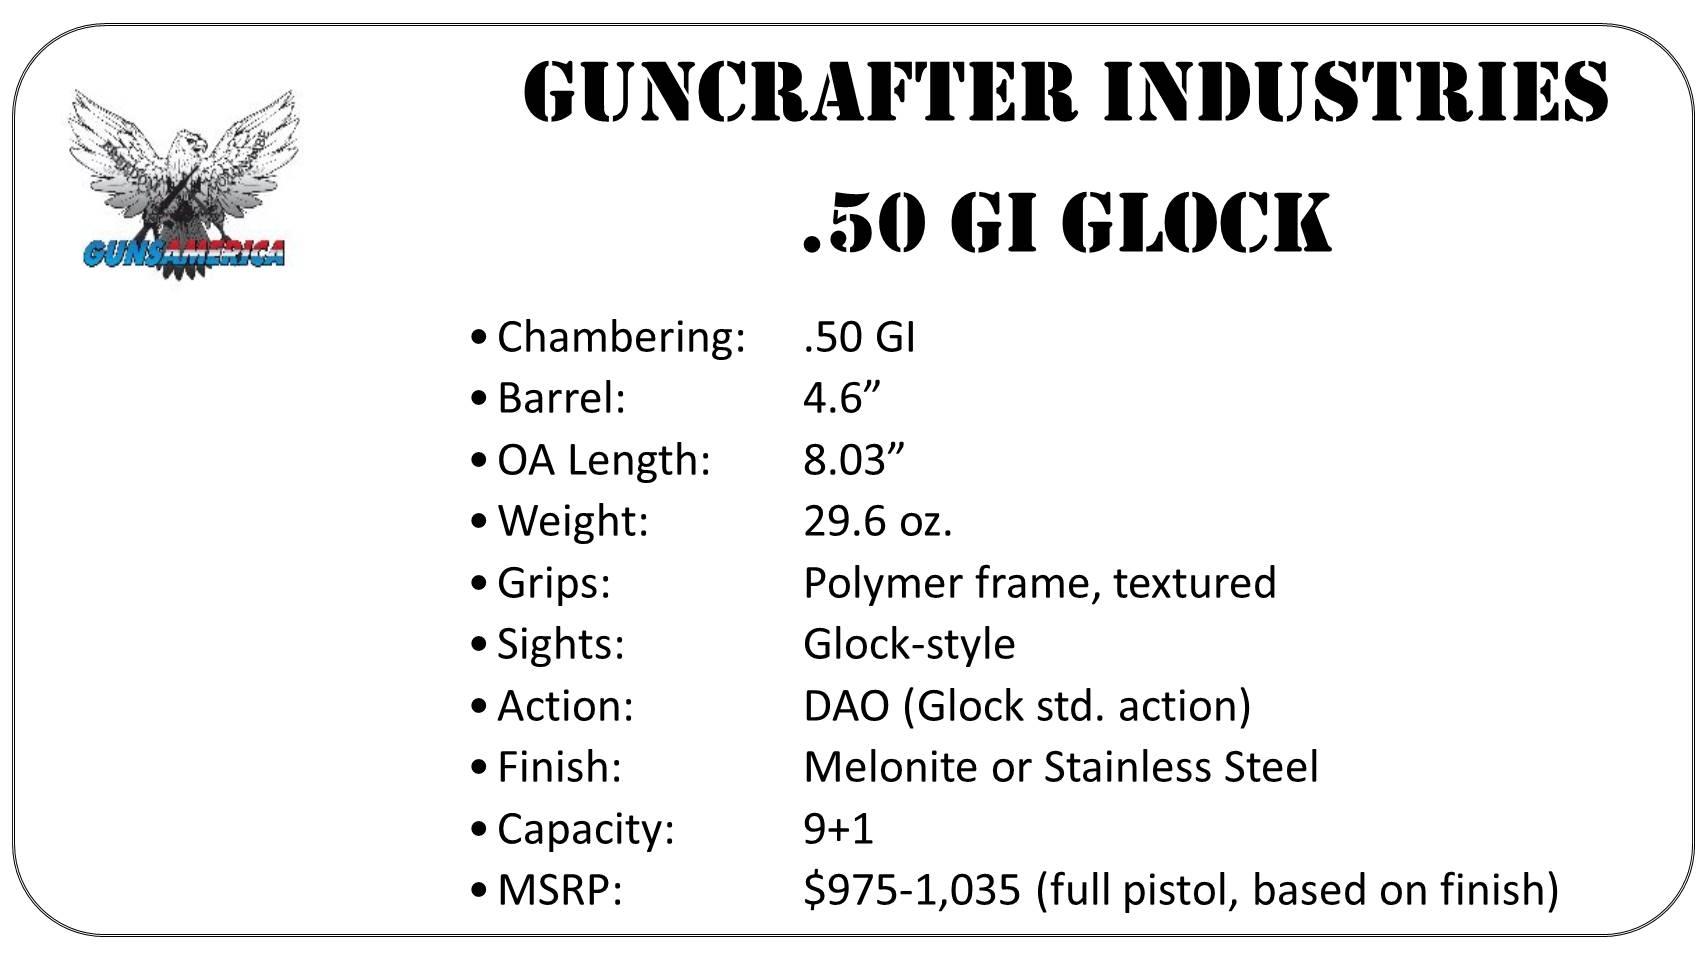 A 50 Caliber Glock Full Review Conversion Kit Complete Gun